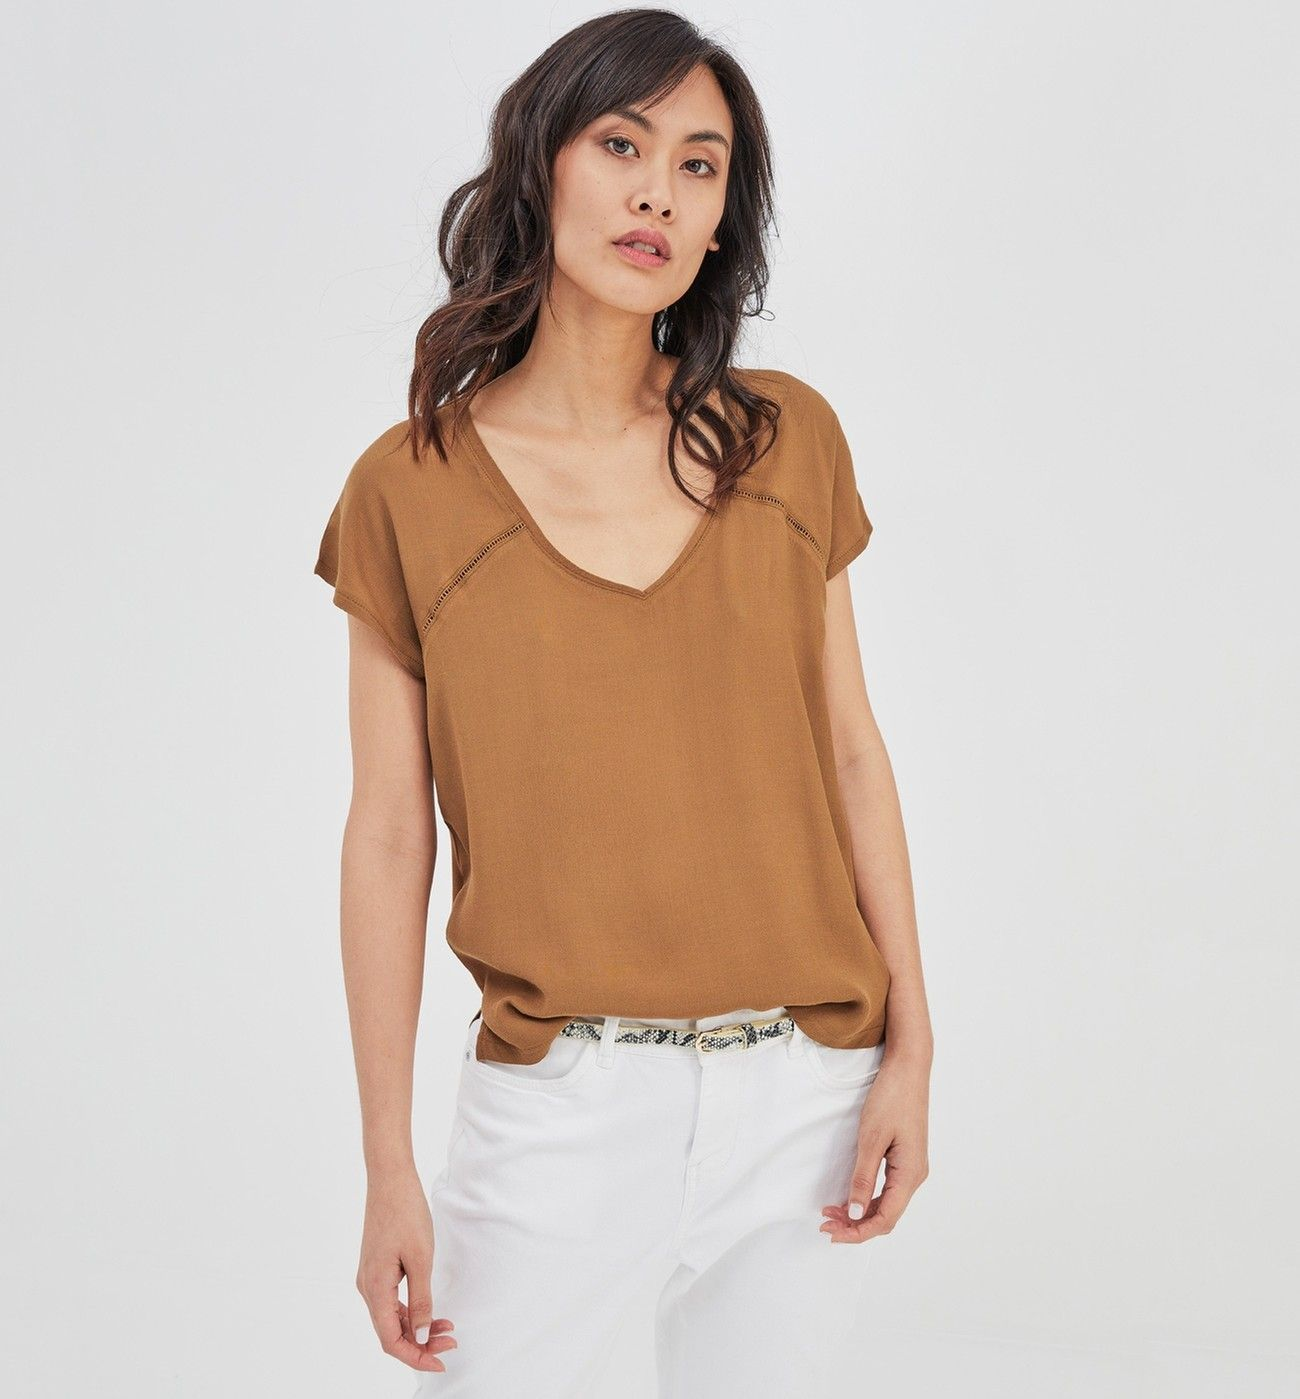 66451f078 Top manches courtes Femme - Vert olive - Tops / T-shirts - Femme ...